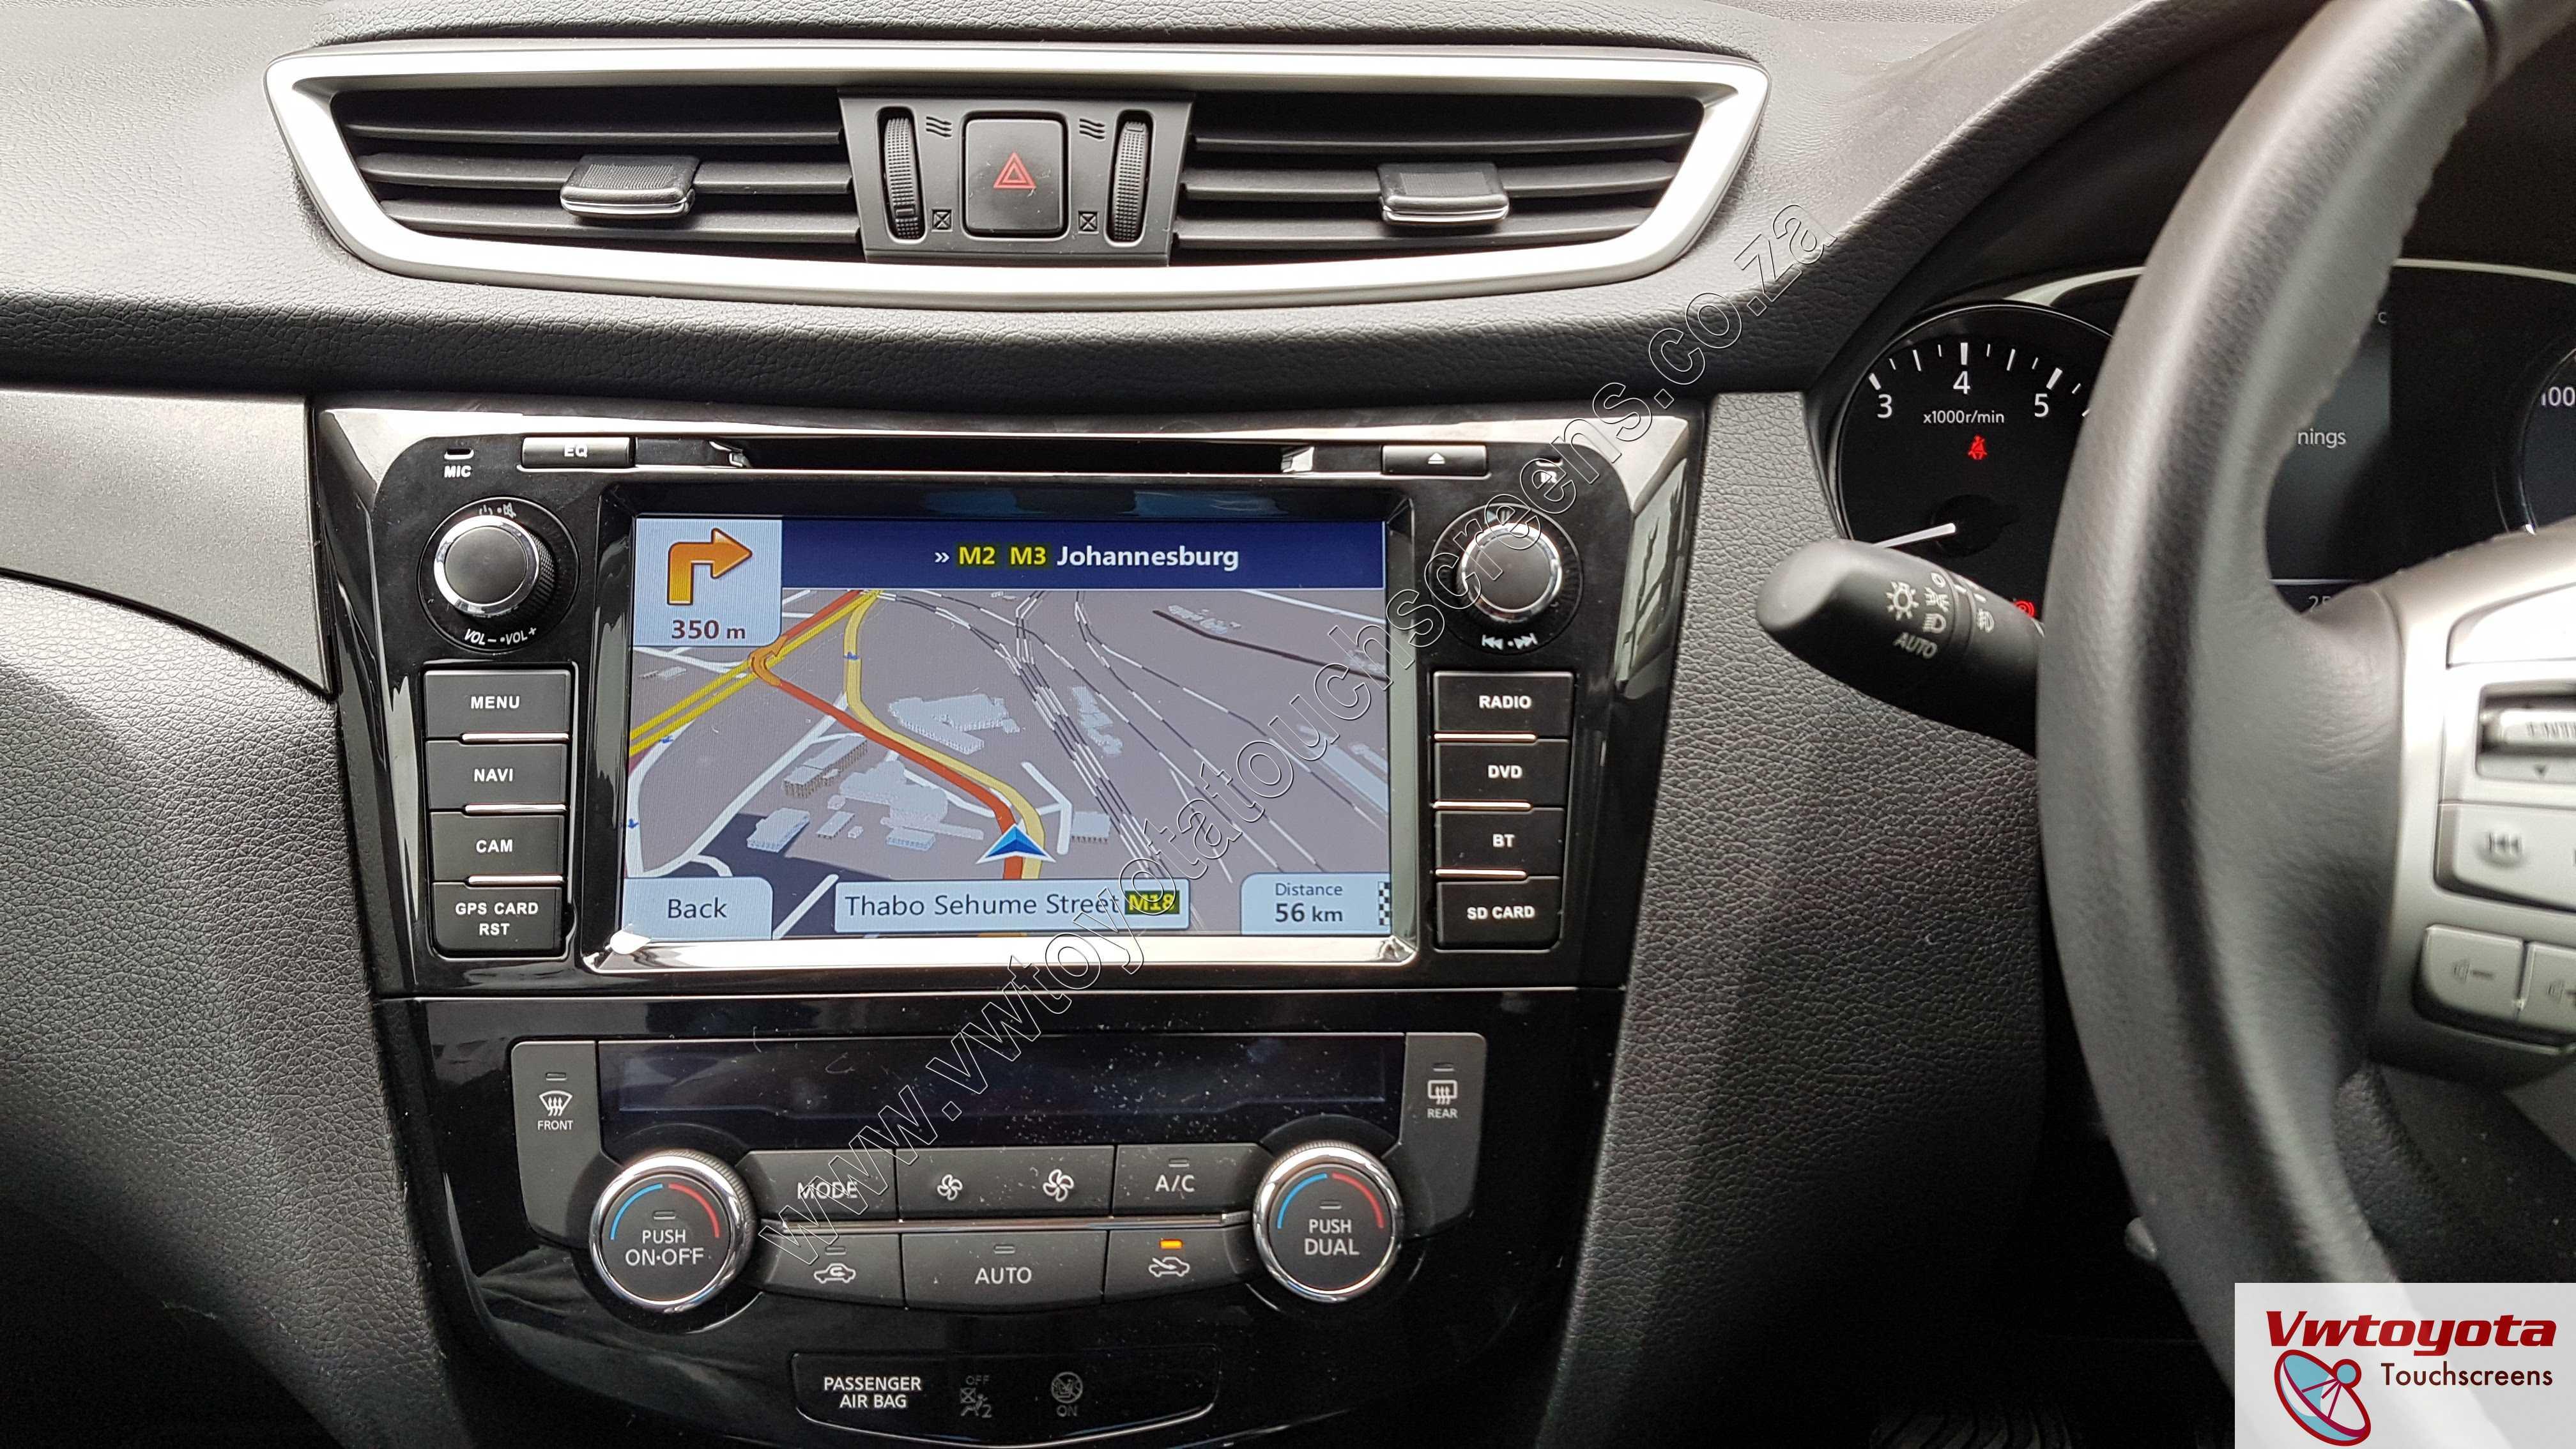 Nissan X-Trail / Qashqai (2014-2018) GPS DVD GPS touch screen unit, FREE  Maps & Reverse Camera